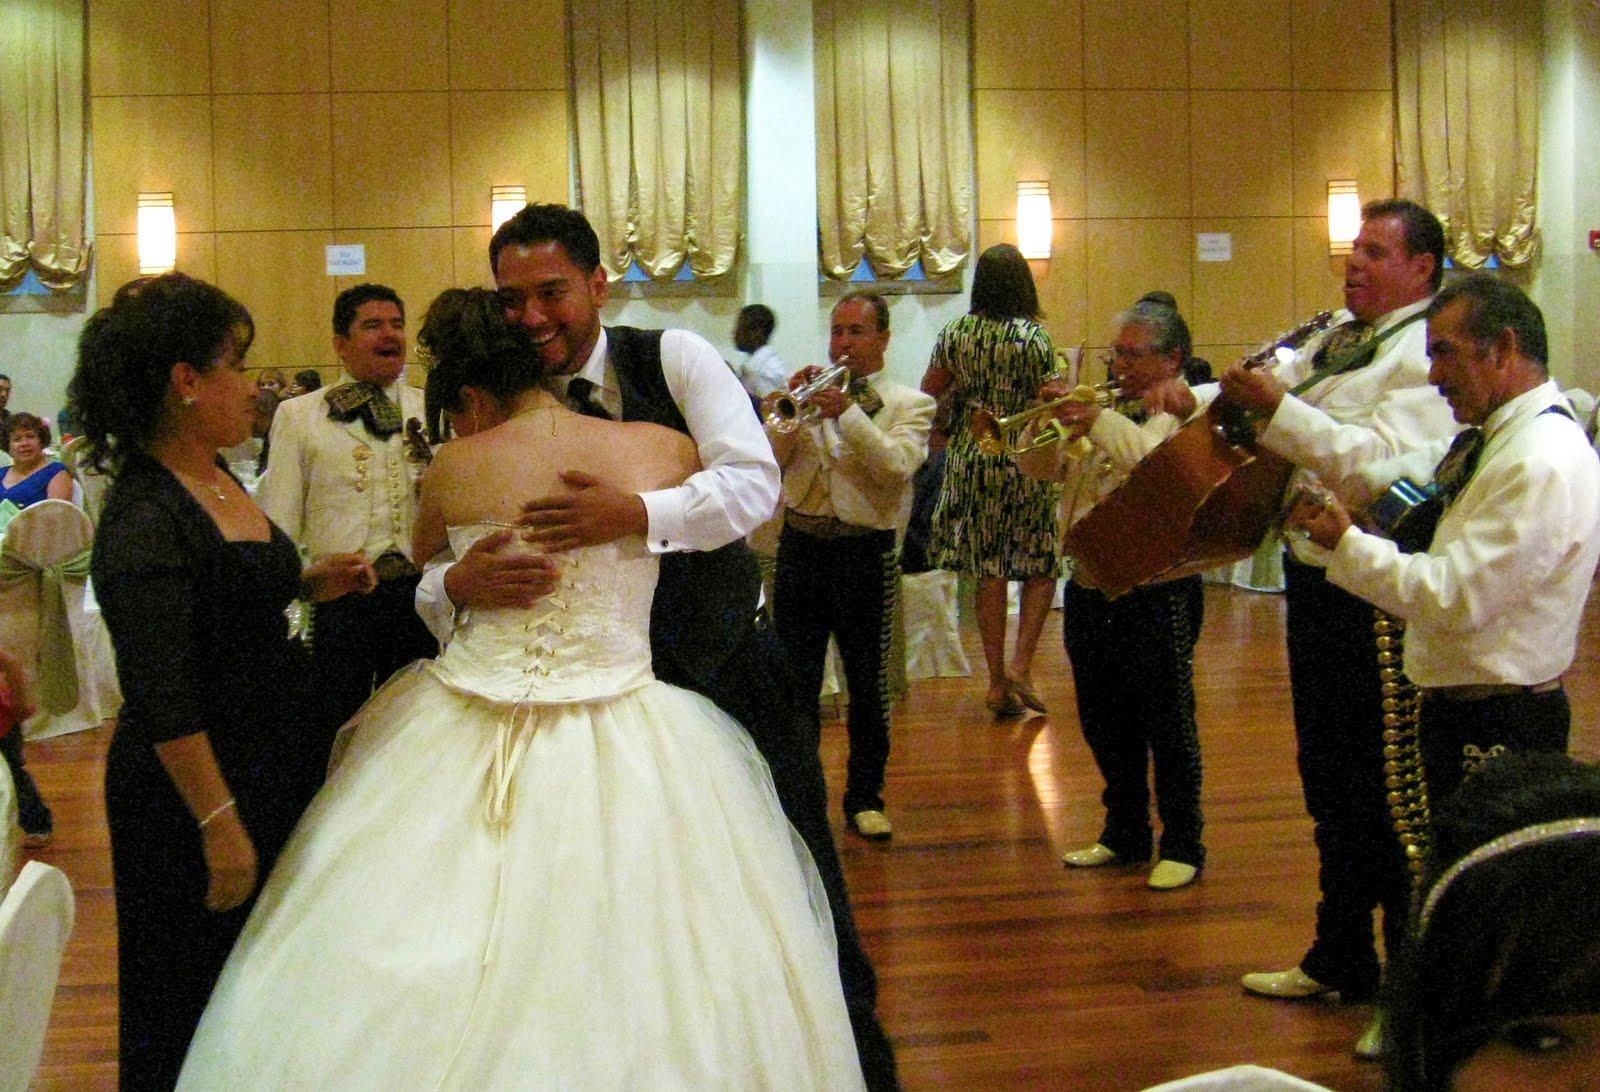 Jenni Rivera Wedding Reception 68613 Usbdata